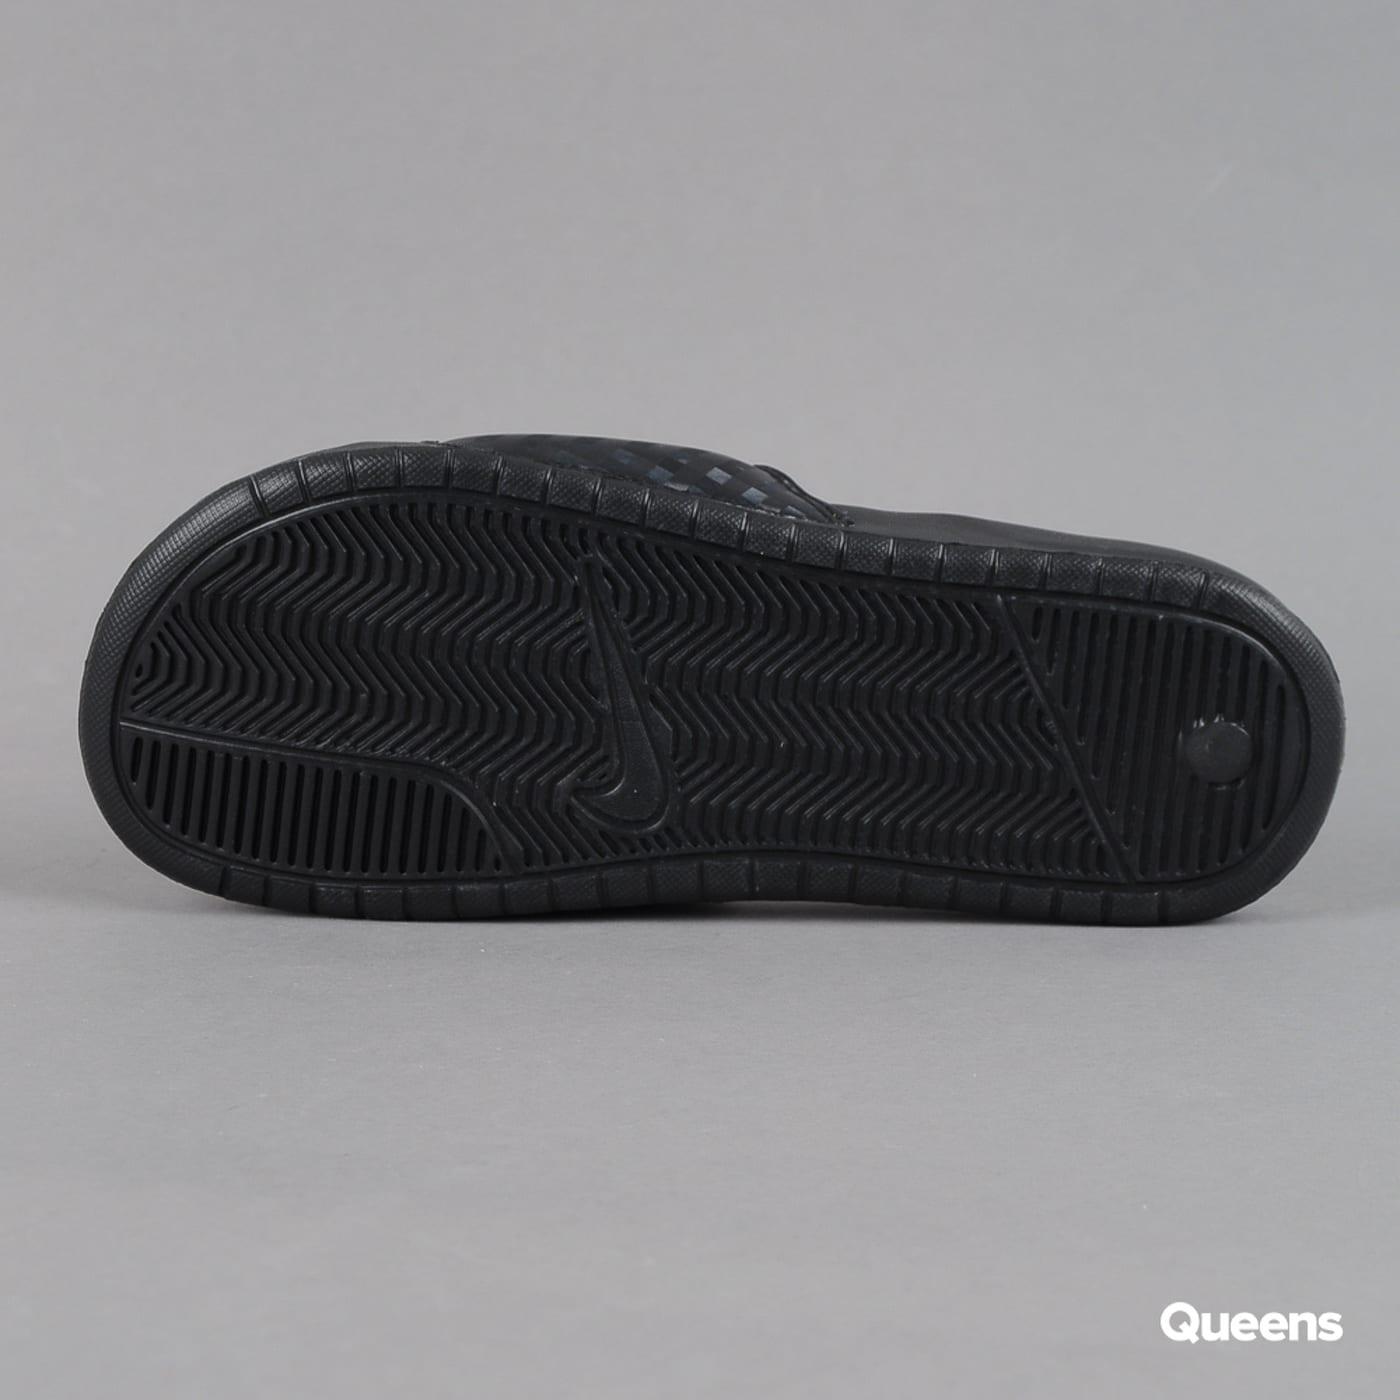 Nike WMNS Benassi JDI black / white